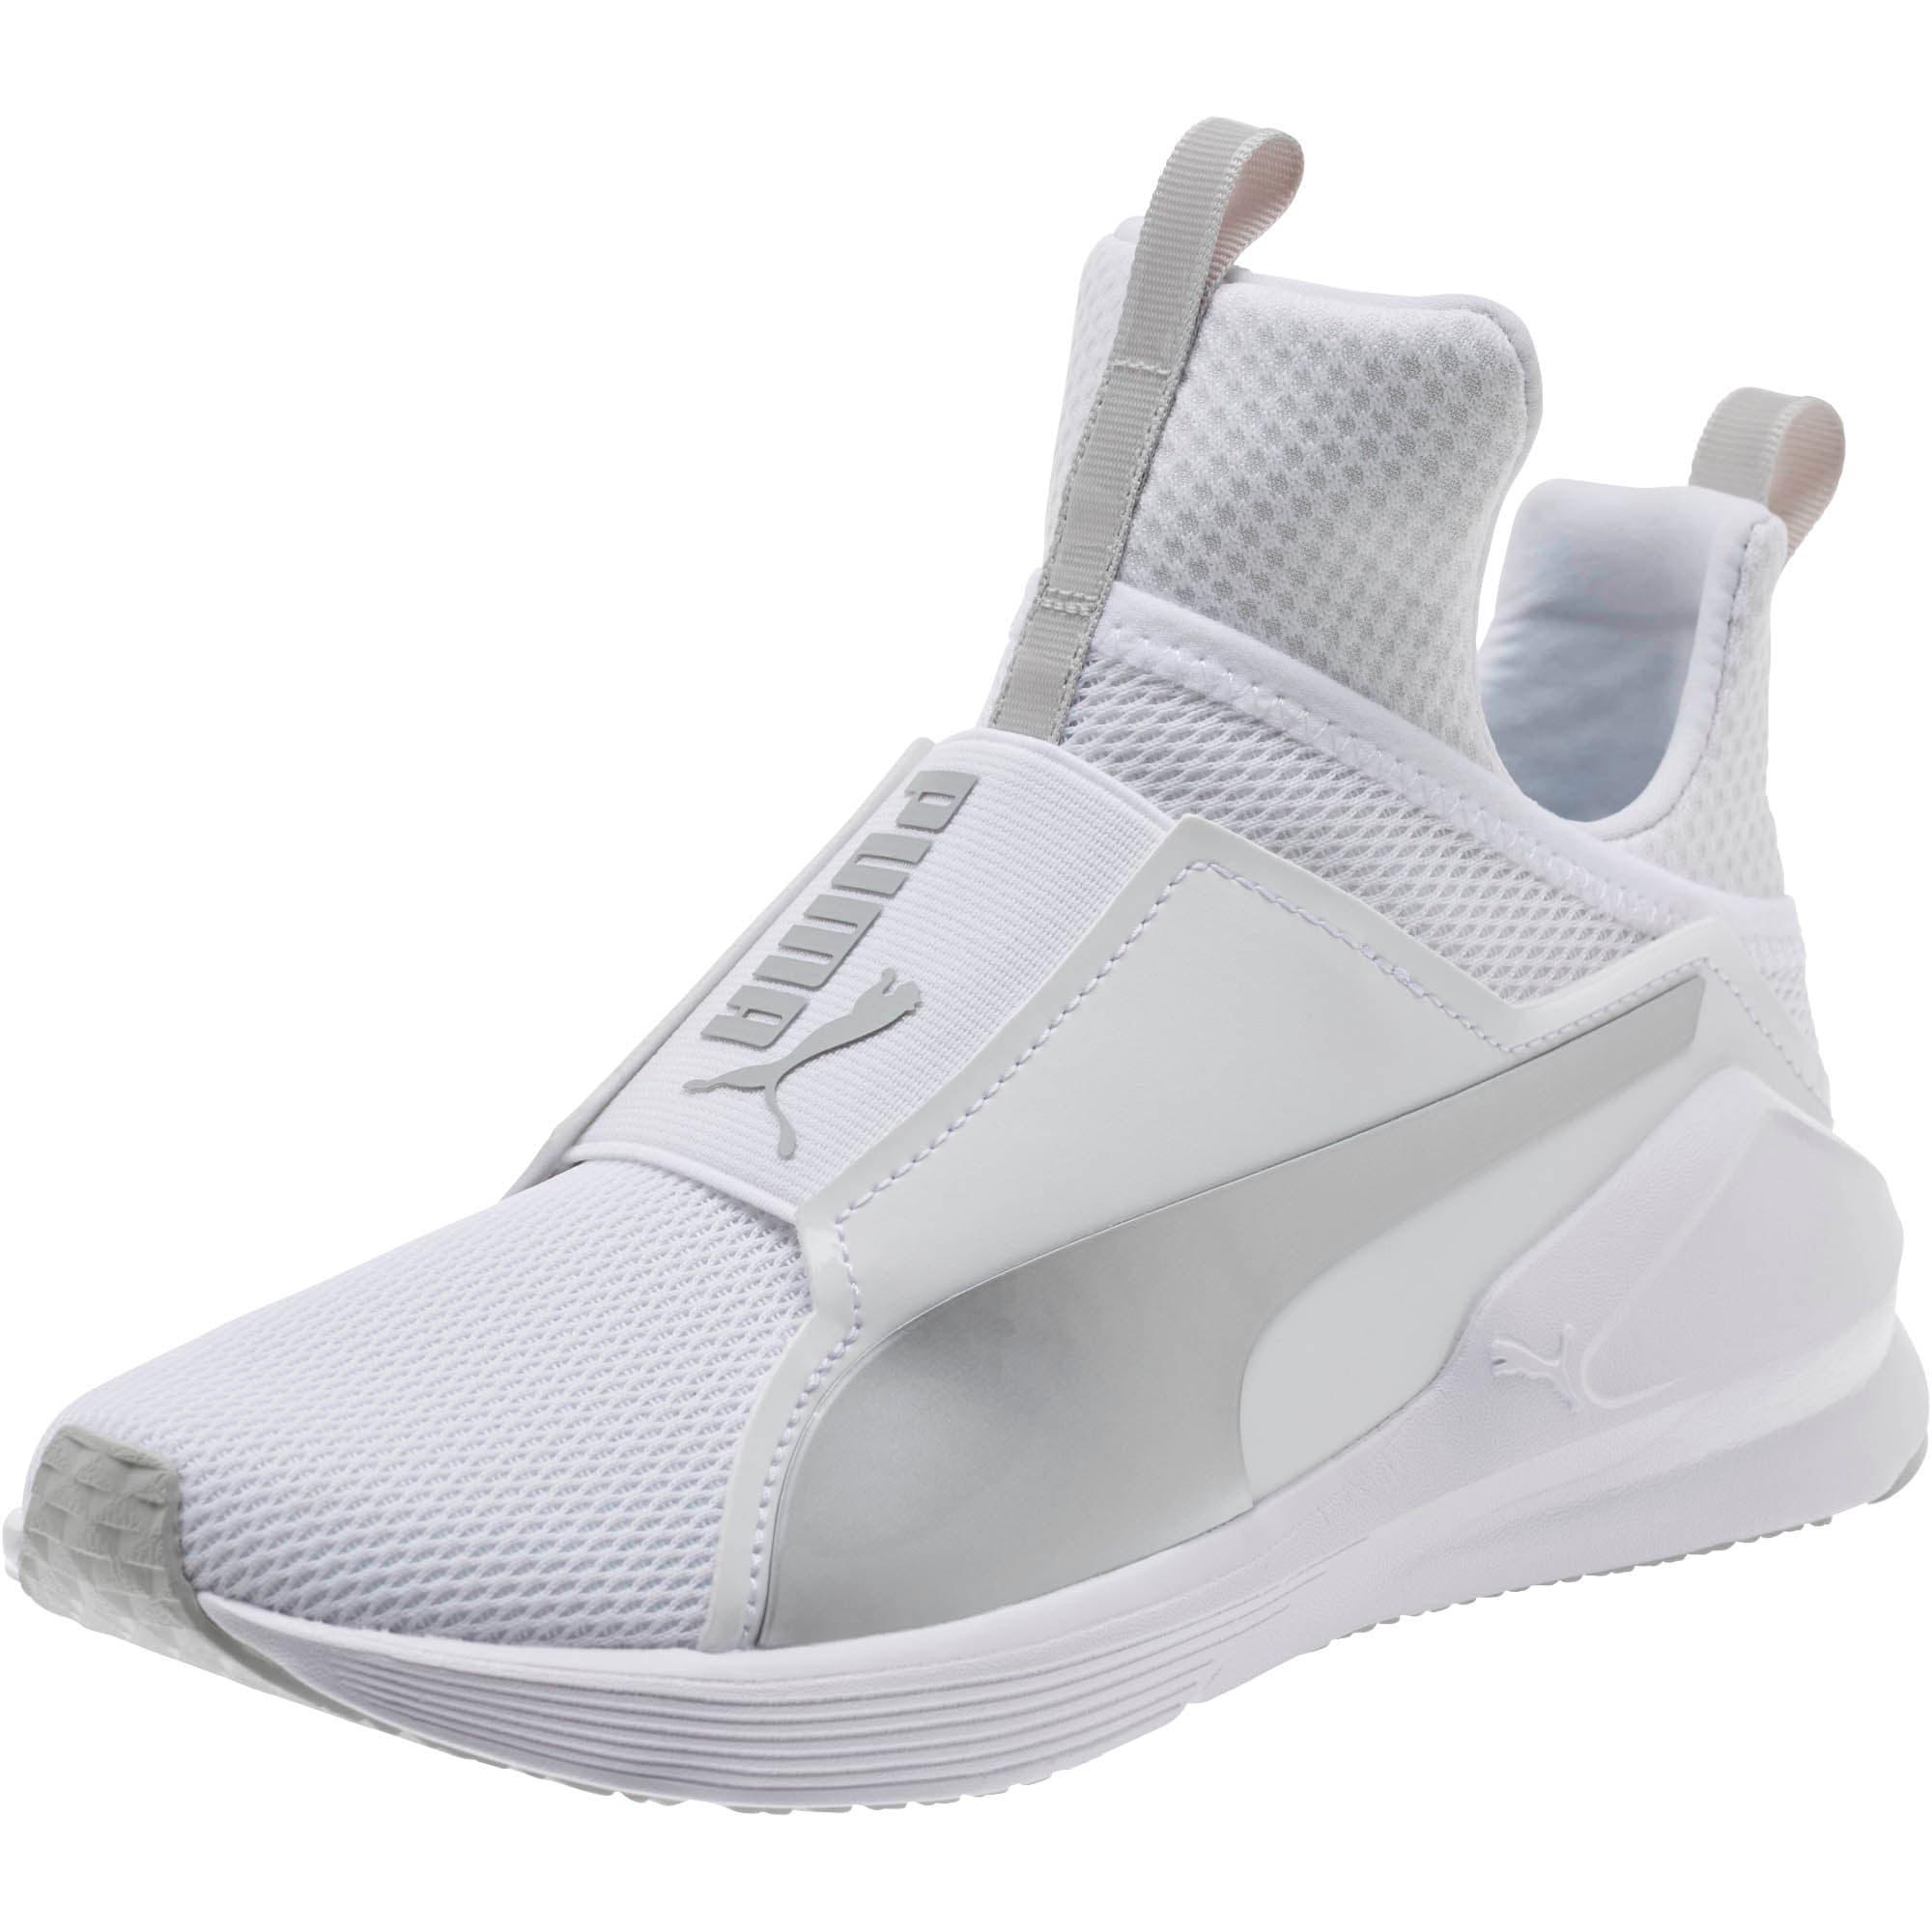 premium selection eab3d 0b538 Fierce Core Sneakers JR